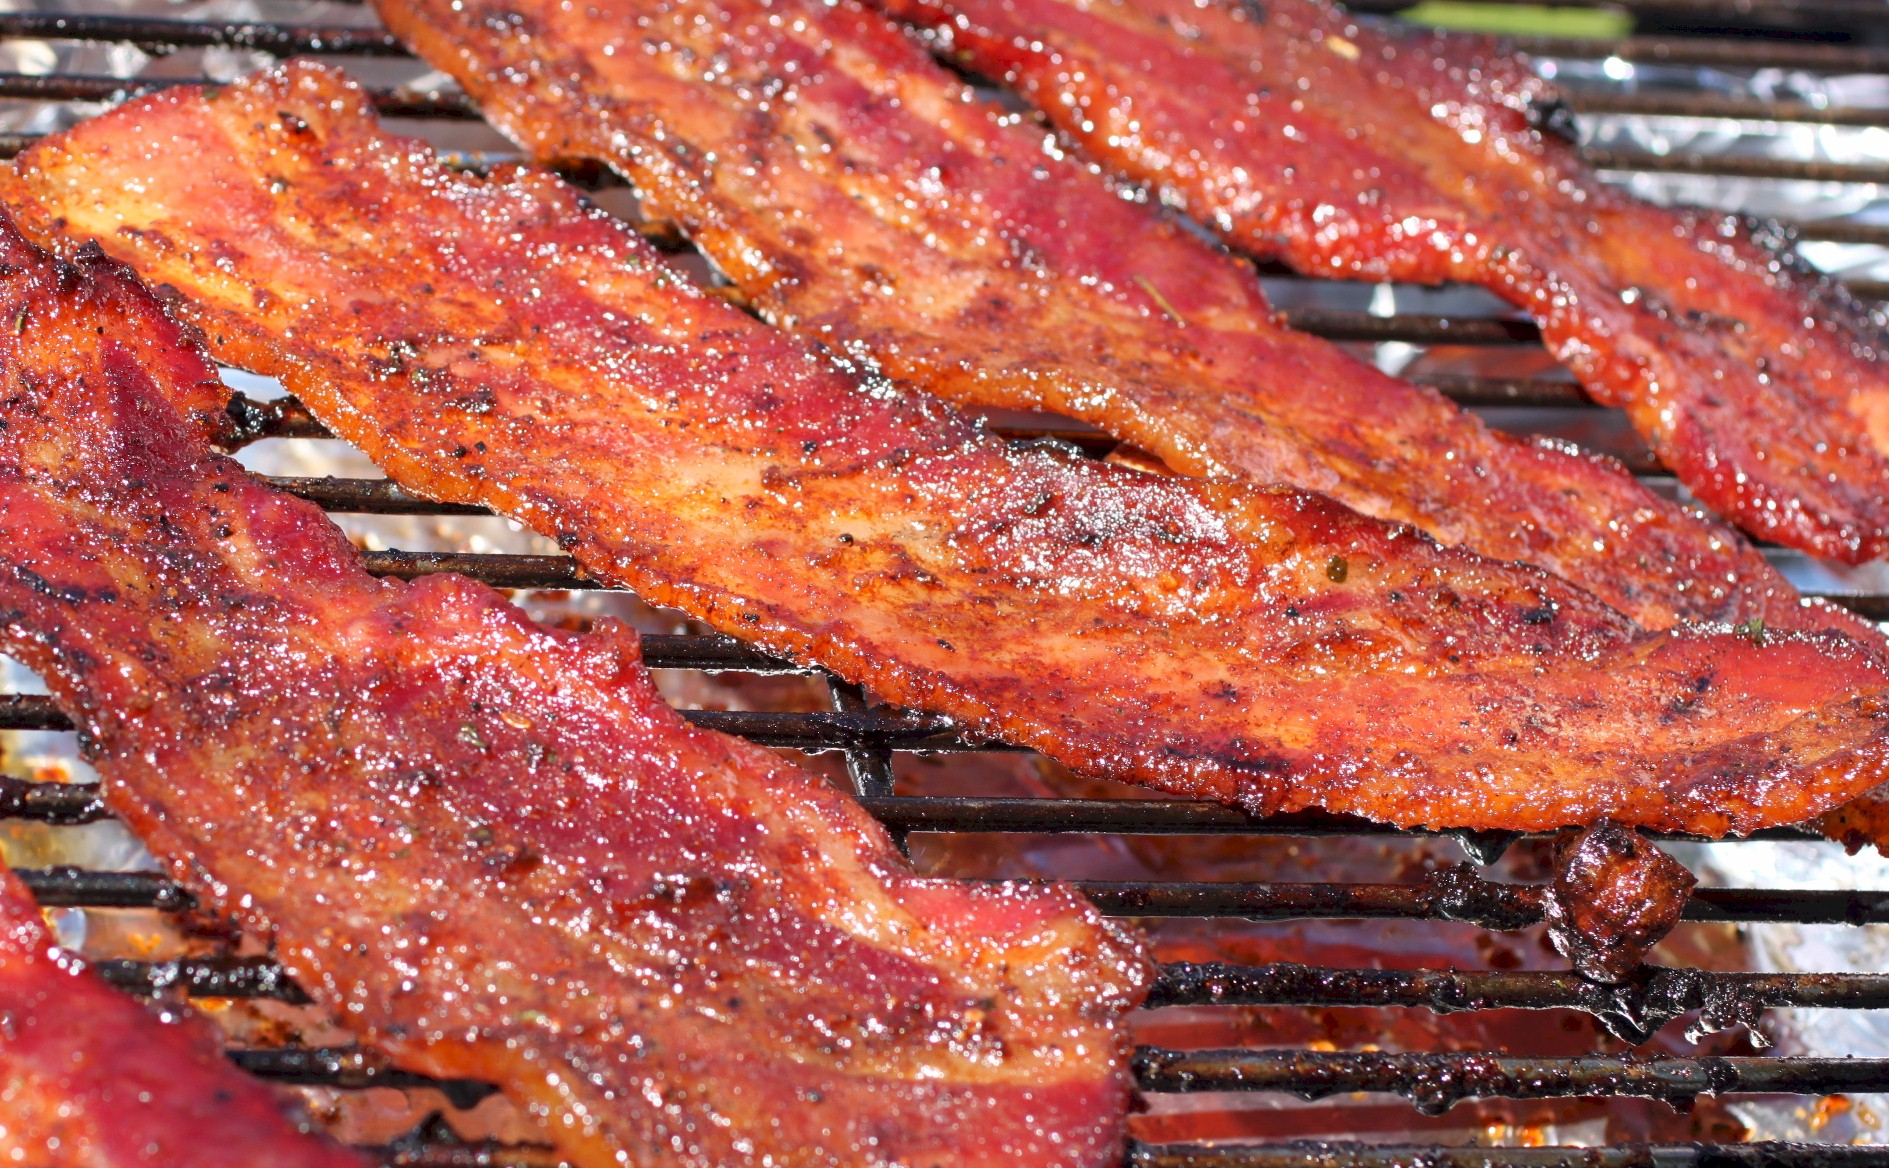 Barbecue Pig Candy | Slap Yo' Daddy BBQ